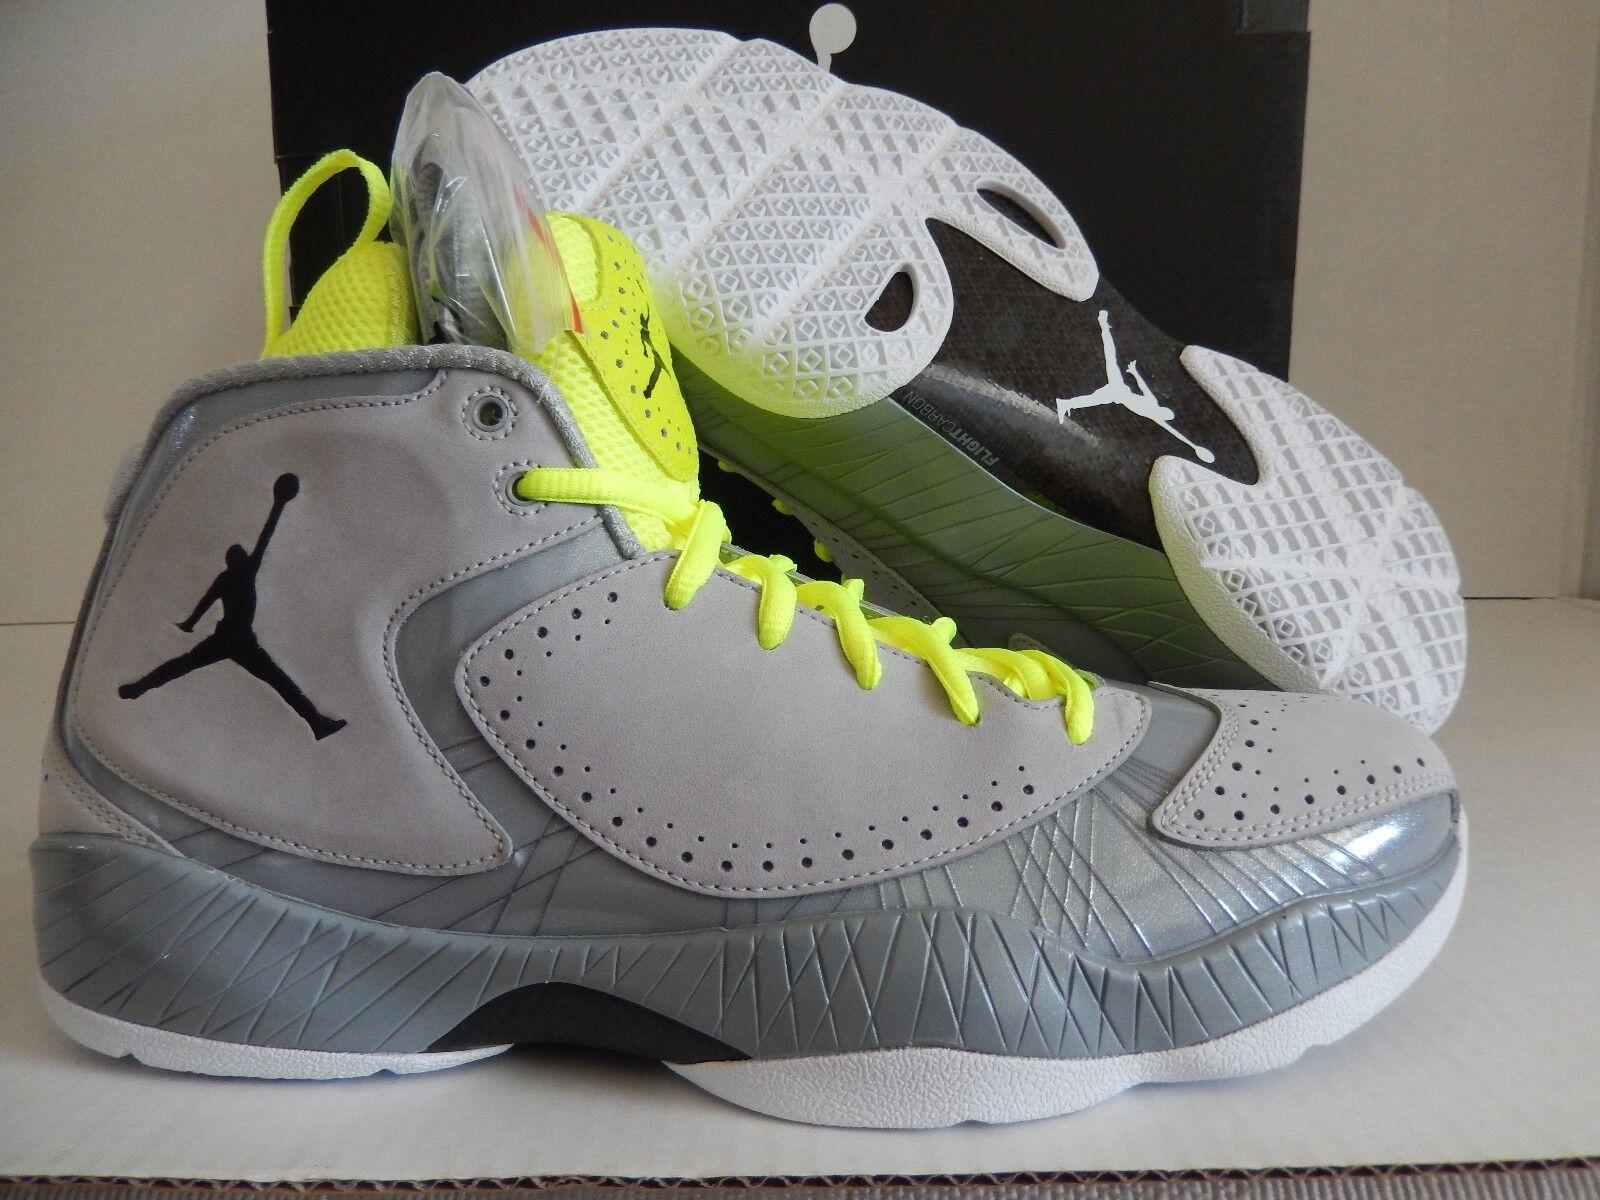 huge discount 5f10b 314a2 Nike Nike Nike Air Jordan 2018 Deluxe Wolf Gris-Negro-Plata ice-wht